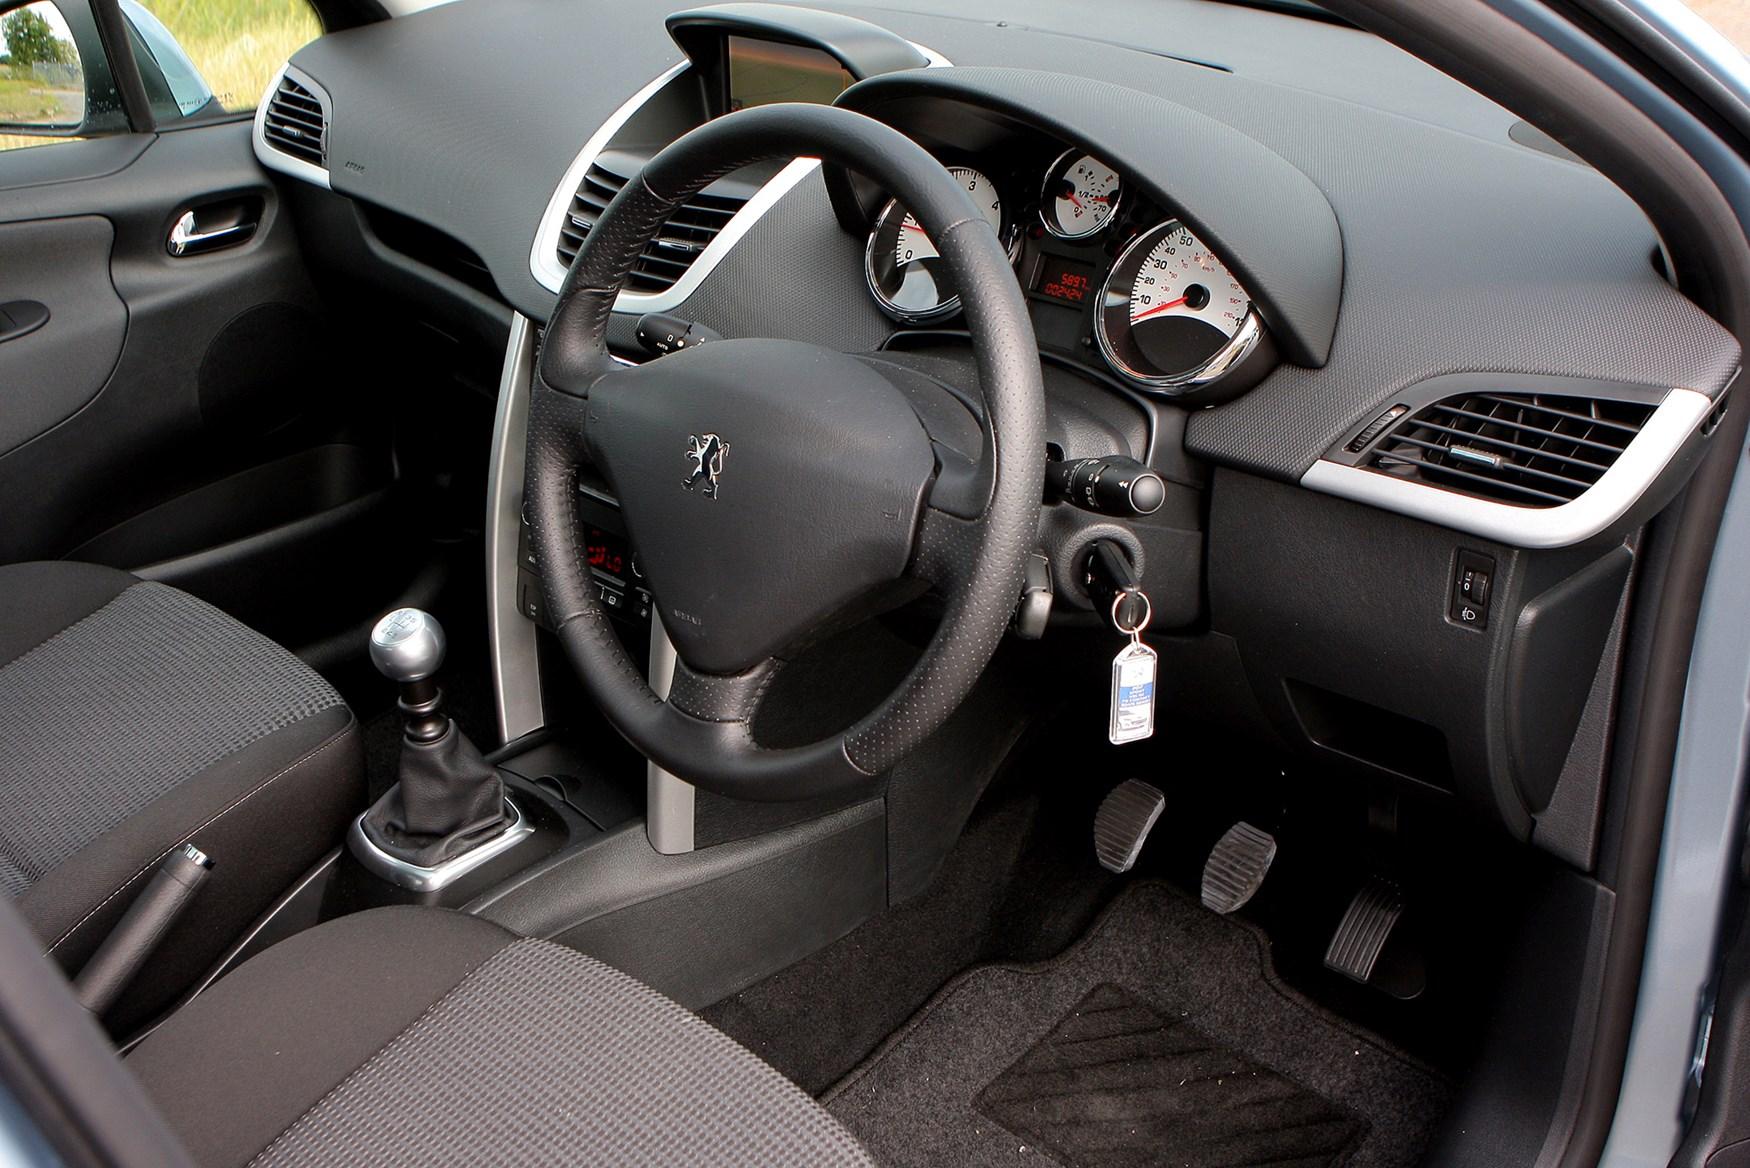 Peugeot 207 hatchback 2006 2012 photos parkers for Peugeot 207 interior